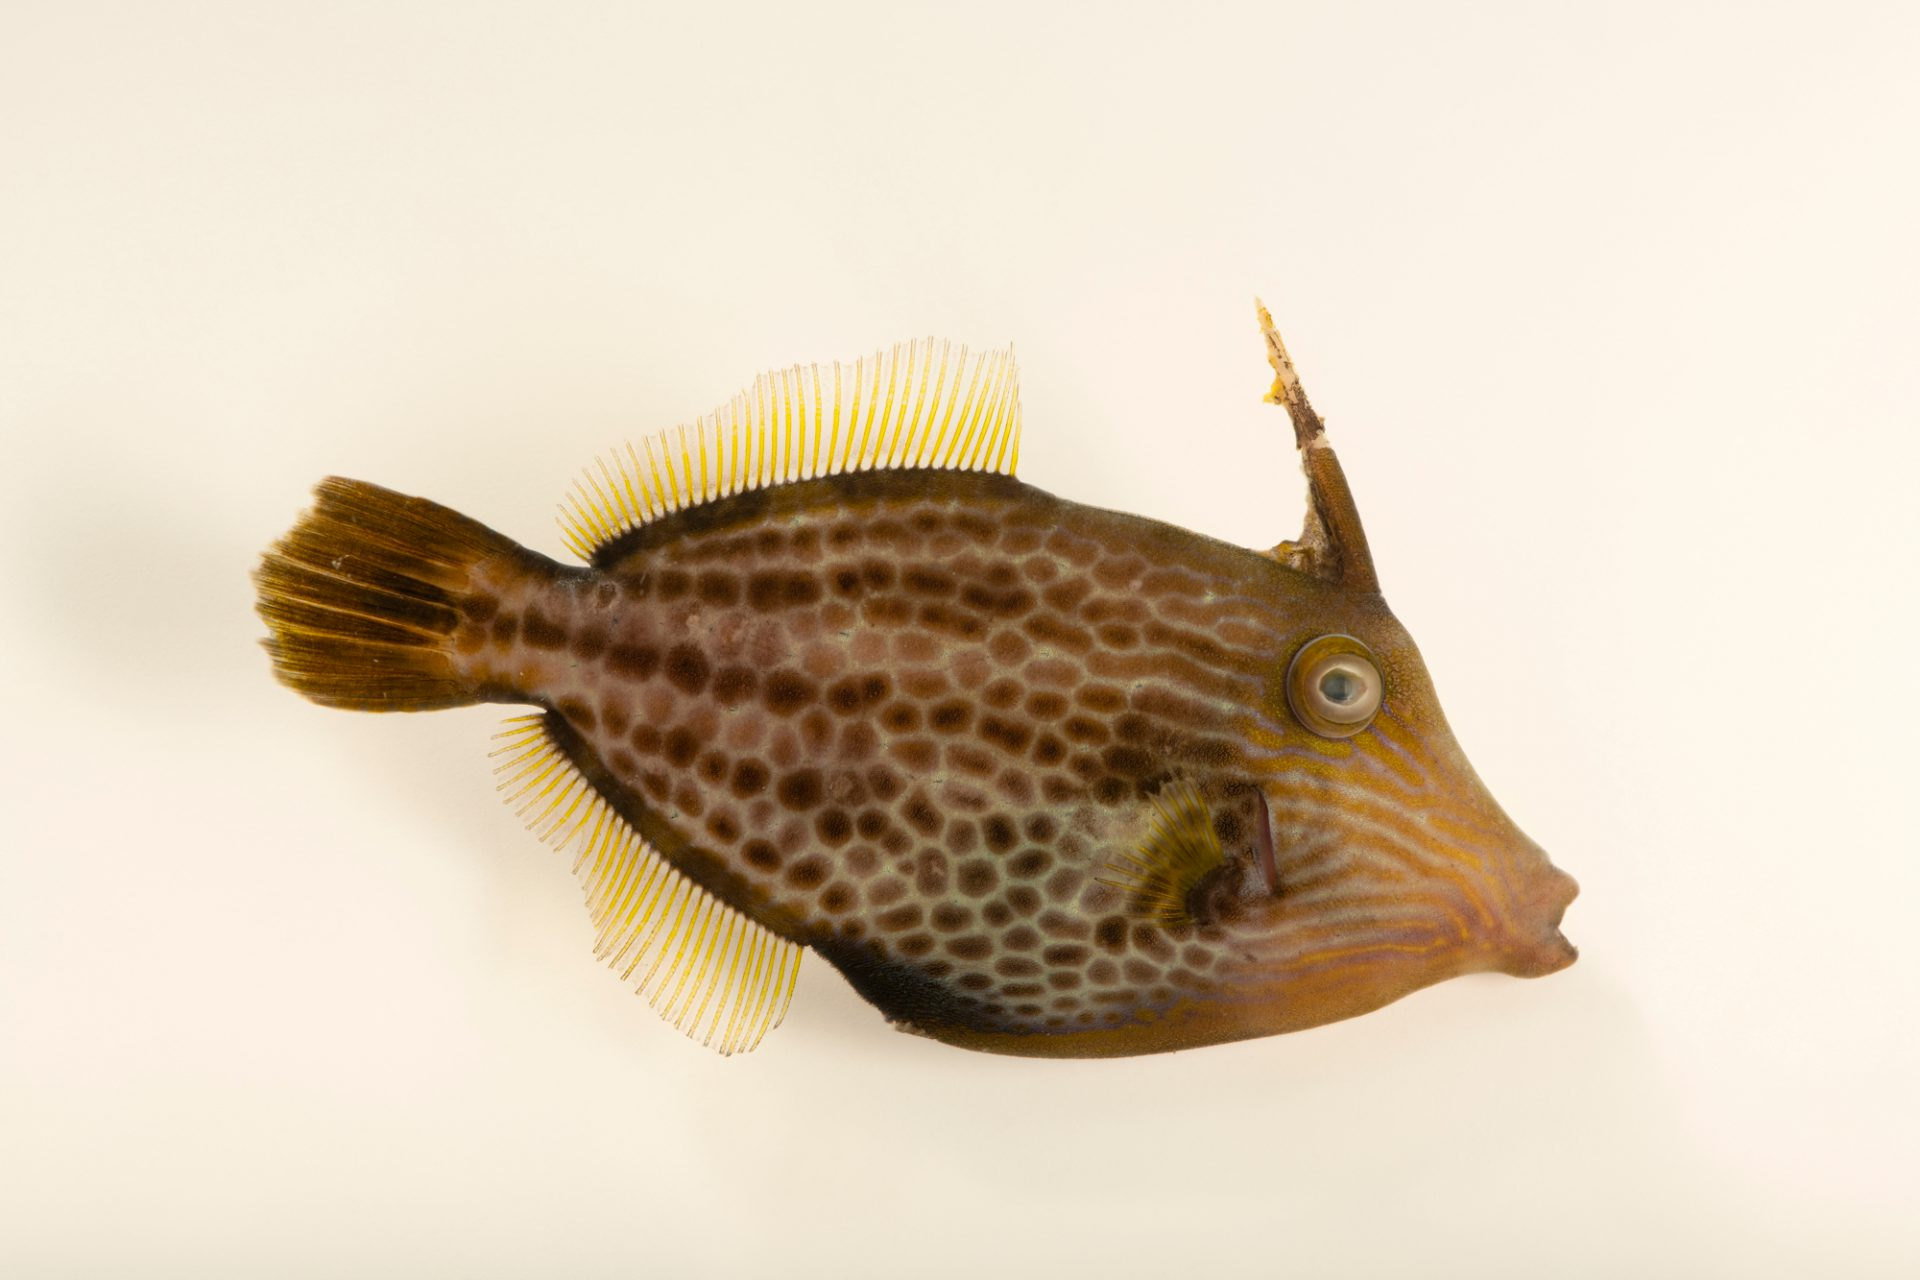 Photo: A honeycomb filefish (Cantherhines pardalis) at Semirara Marine Hatchery Laboratory in the Philippines.